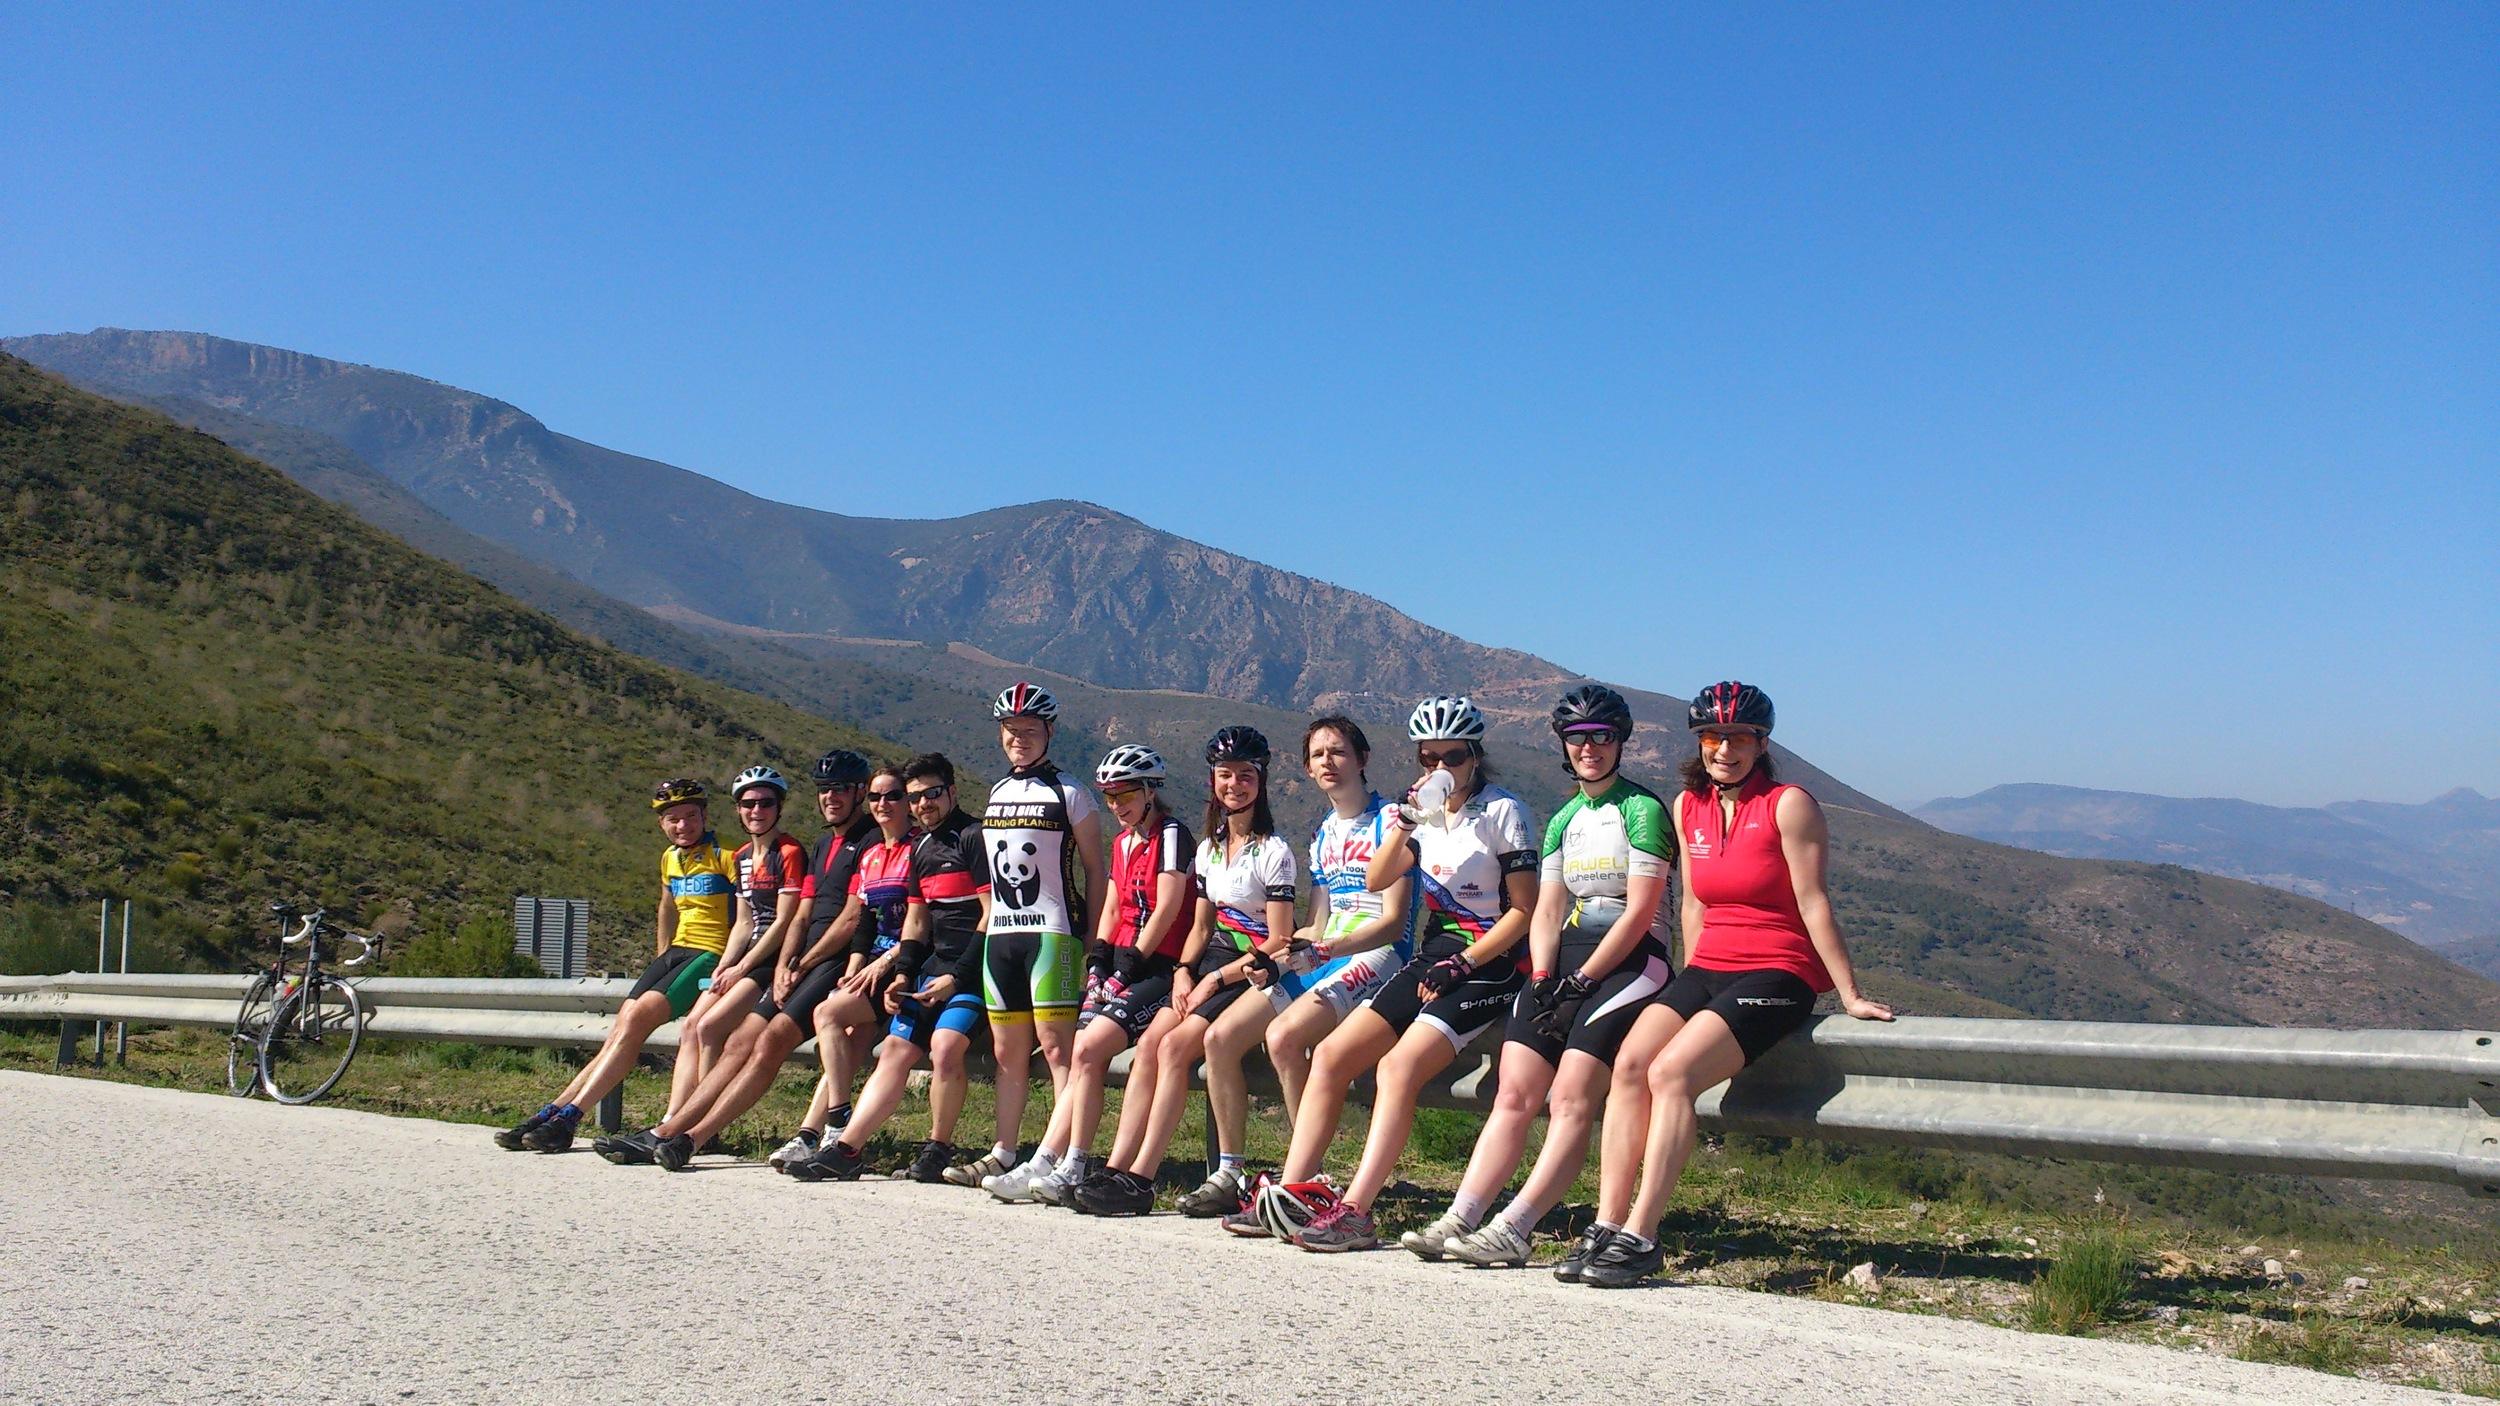 YOGA CYCLING HOLIDAY CYCLE VACATION SPAIN SIERRA NEVADA ANDALUSIA WINTER SPRING CYCLING BREAK YOGA ROAD CYCLING